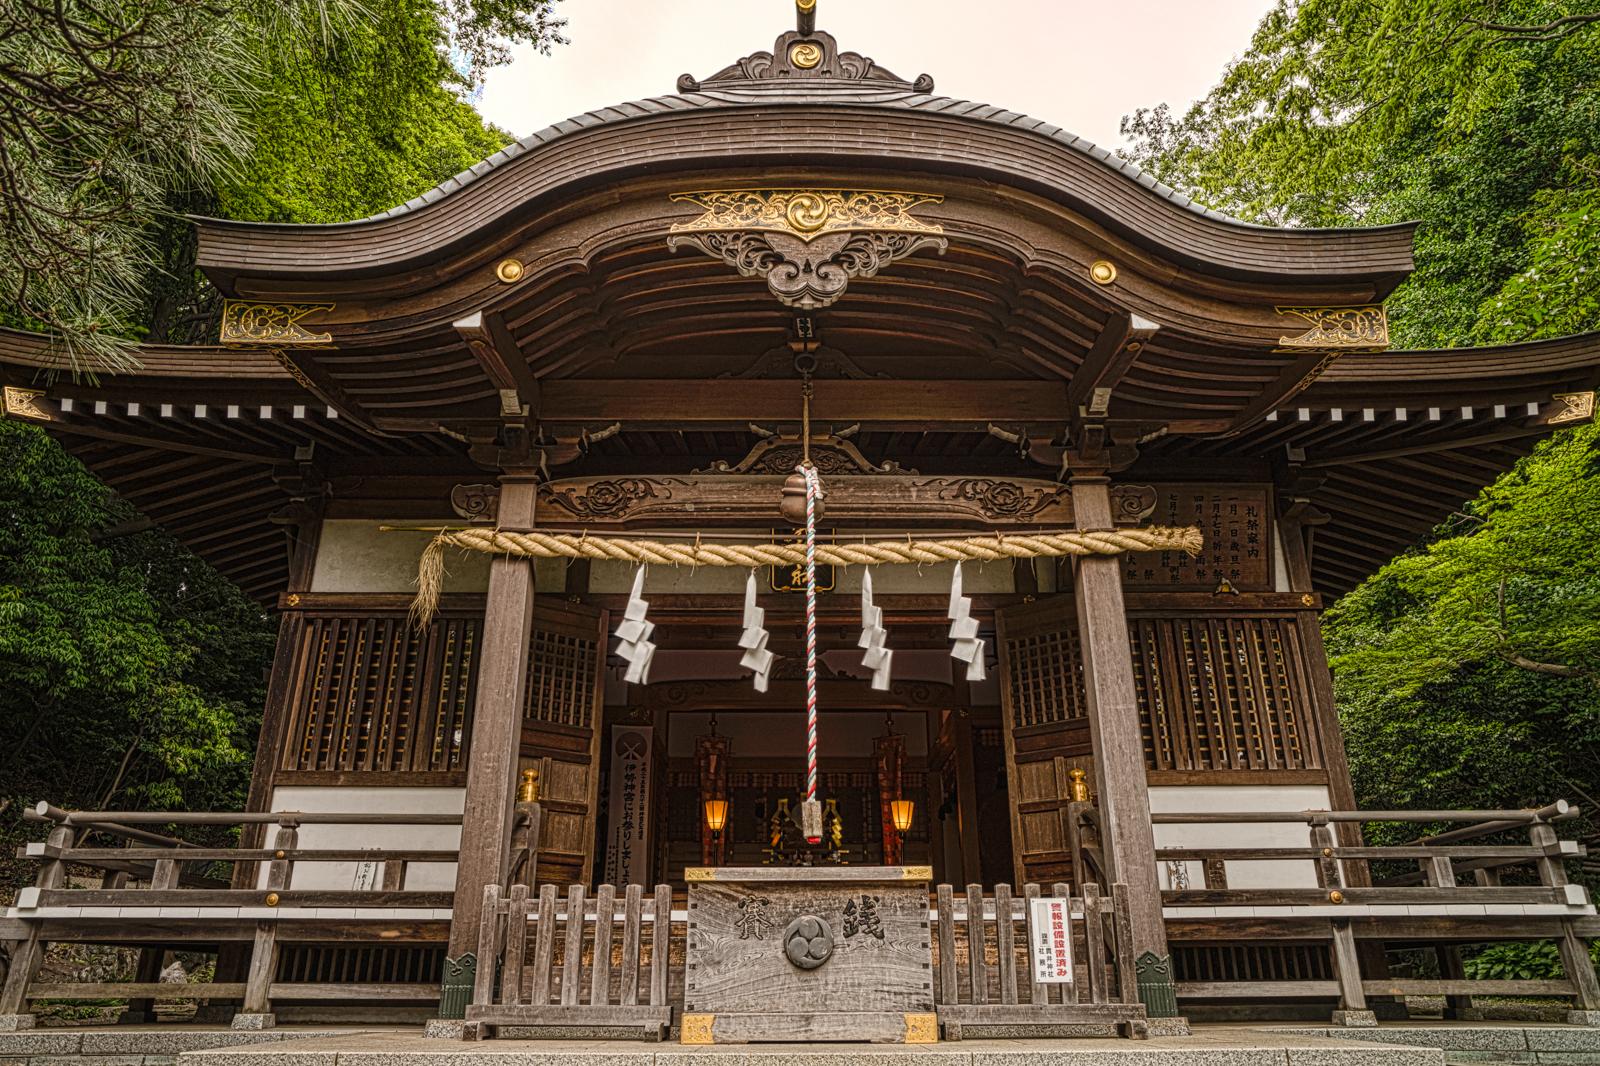 小金井市、貫井神社の本殿の写真